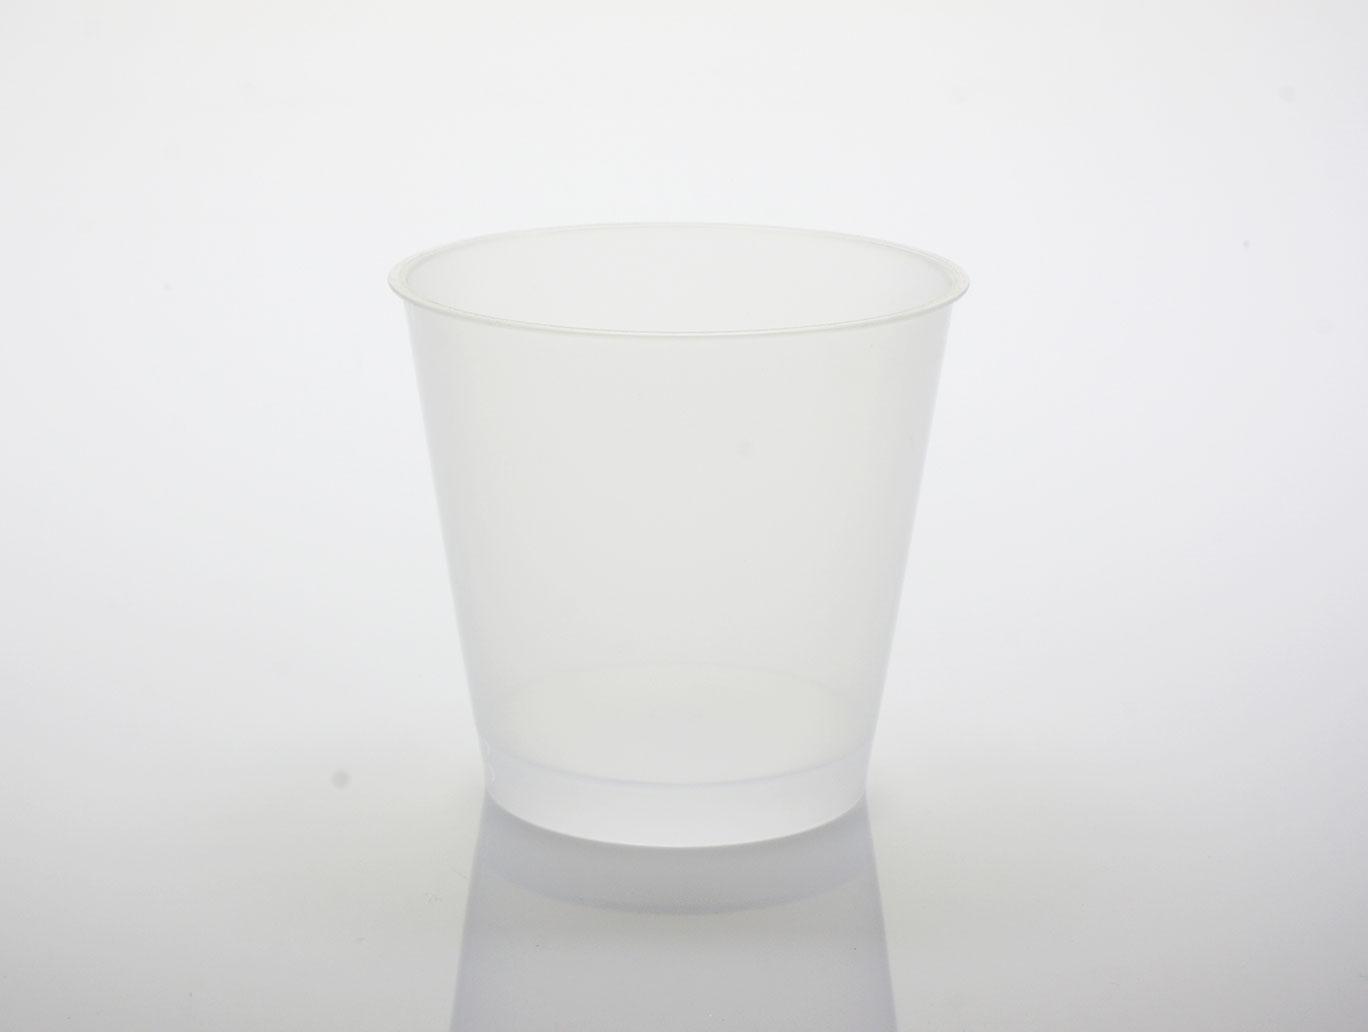 【BS77】布丁燒、布丁杯、烤布丁、PP杯、耐熱杯、耐烤杯、奶酪杯、大圓杯(25個+蓋)